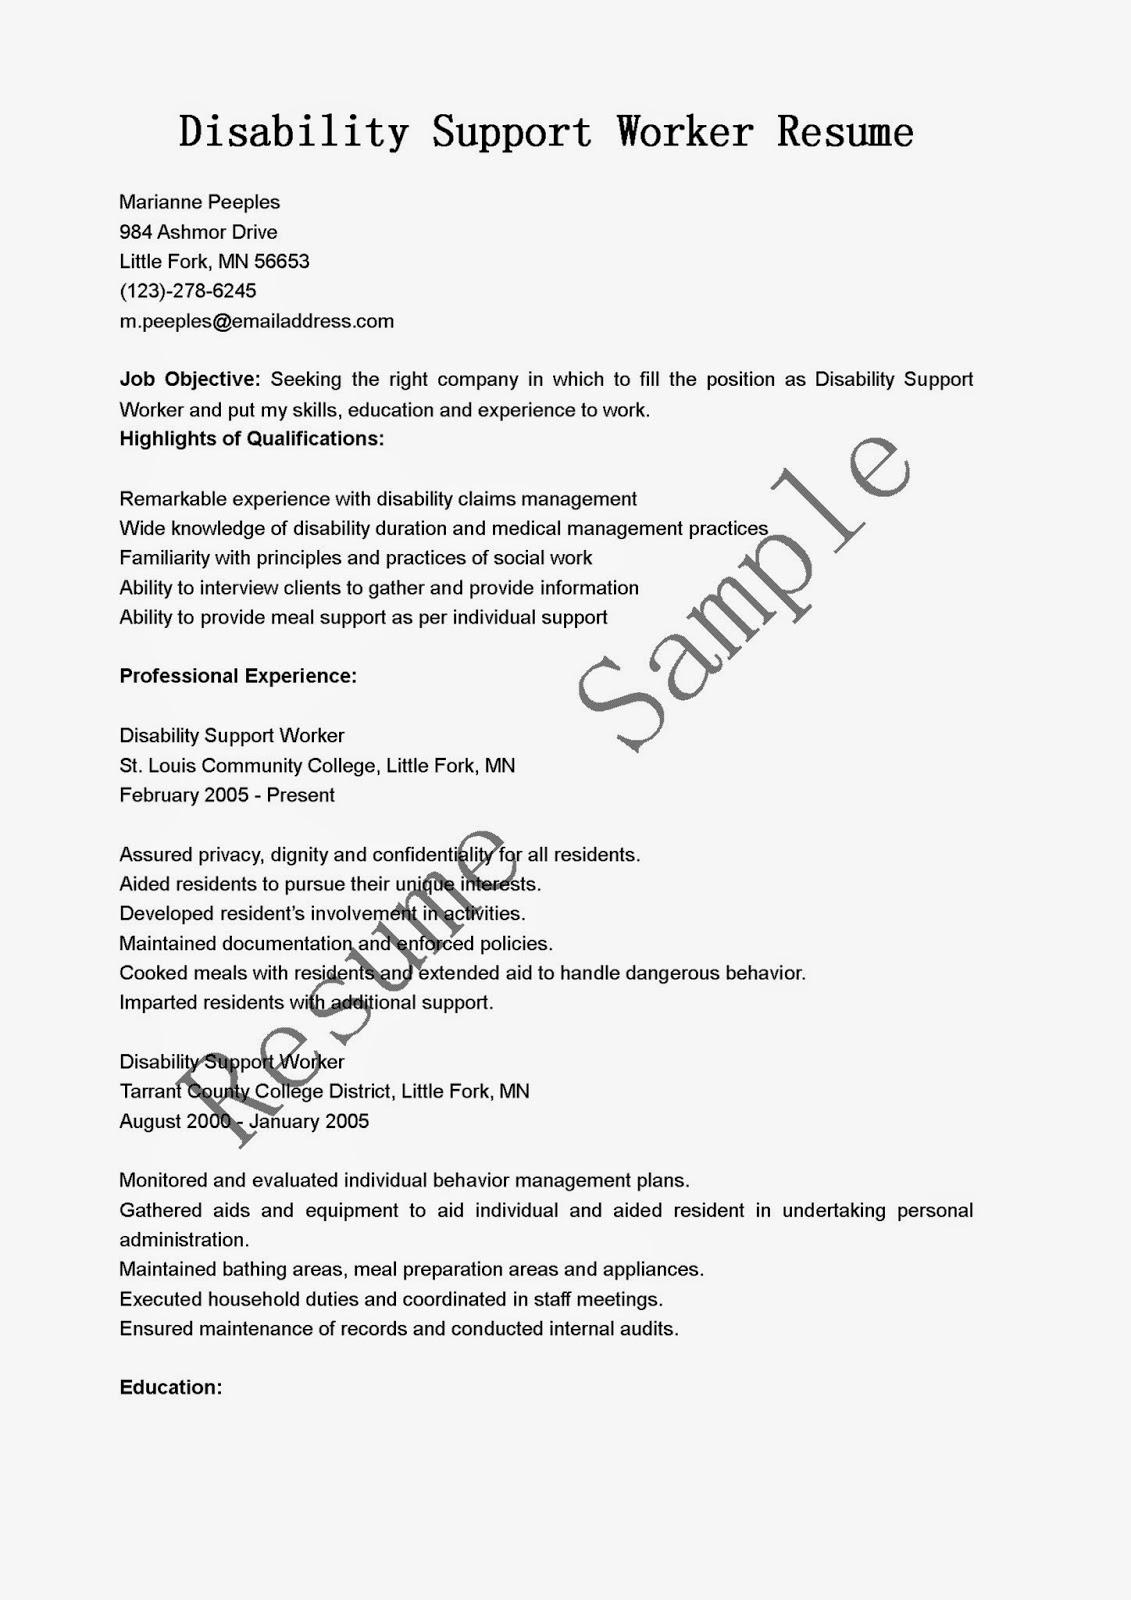 resume samples  disability support worker resume sample